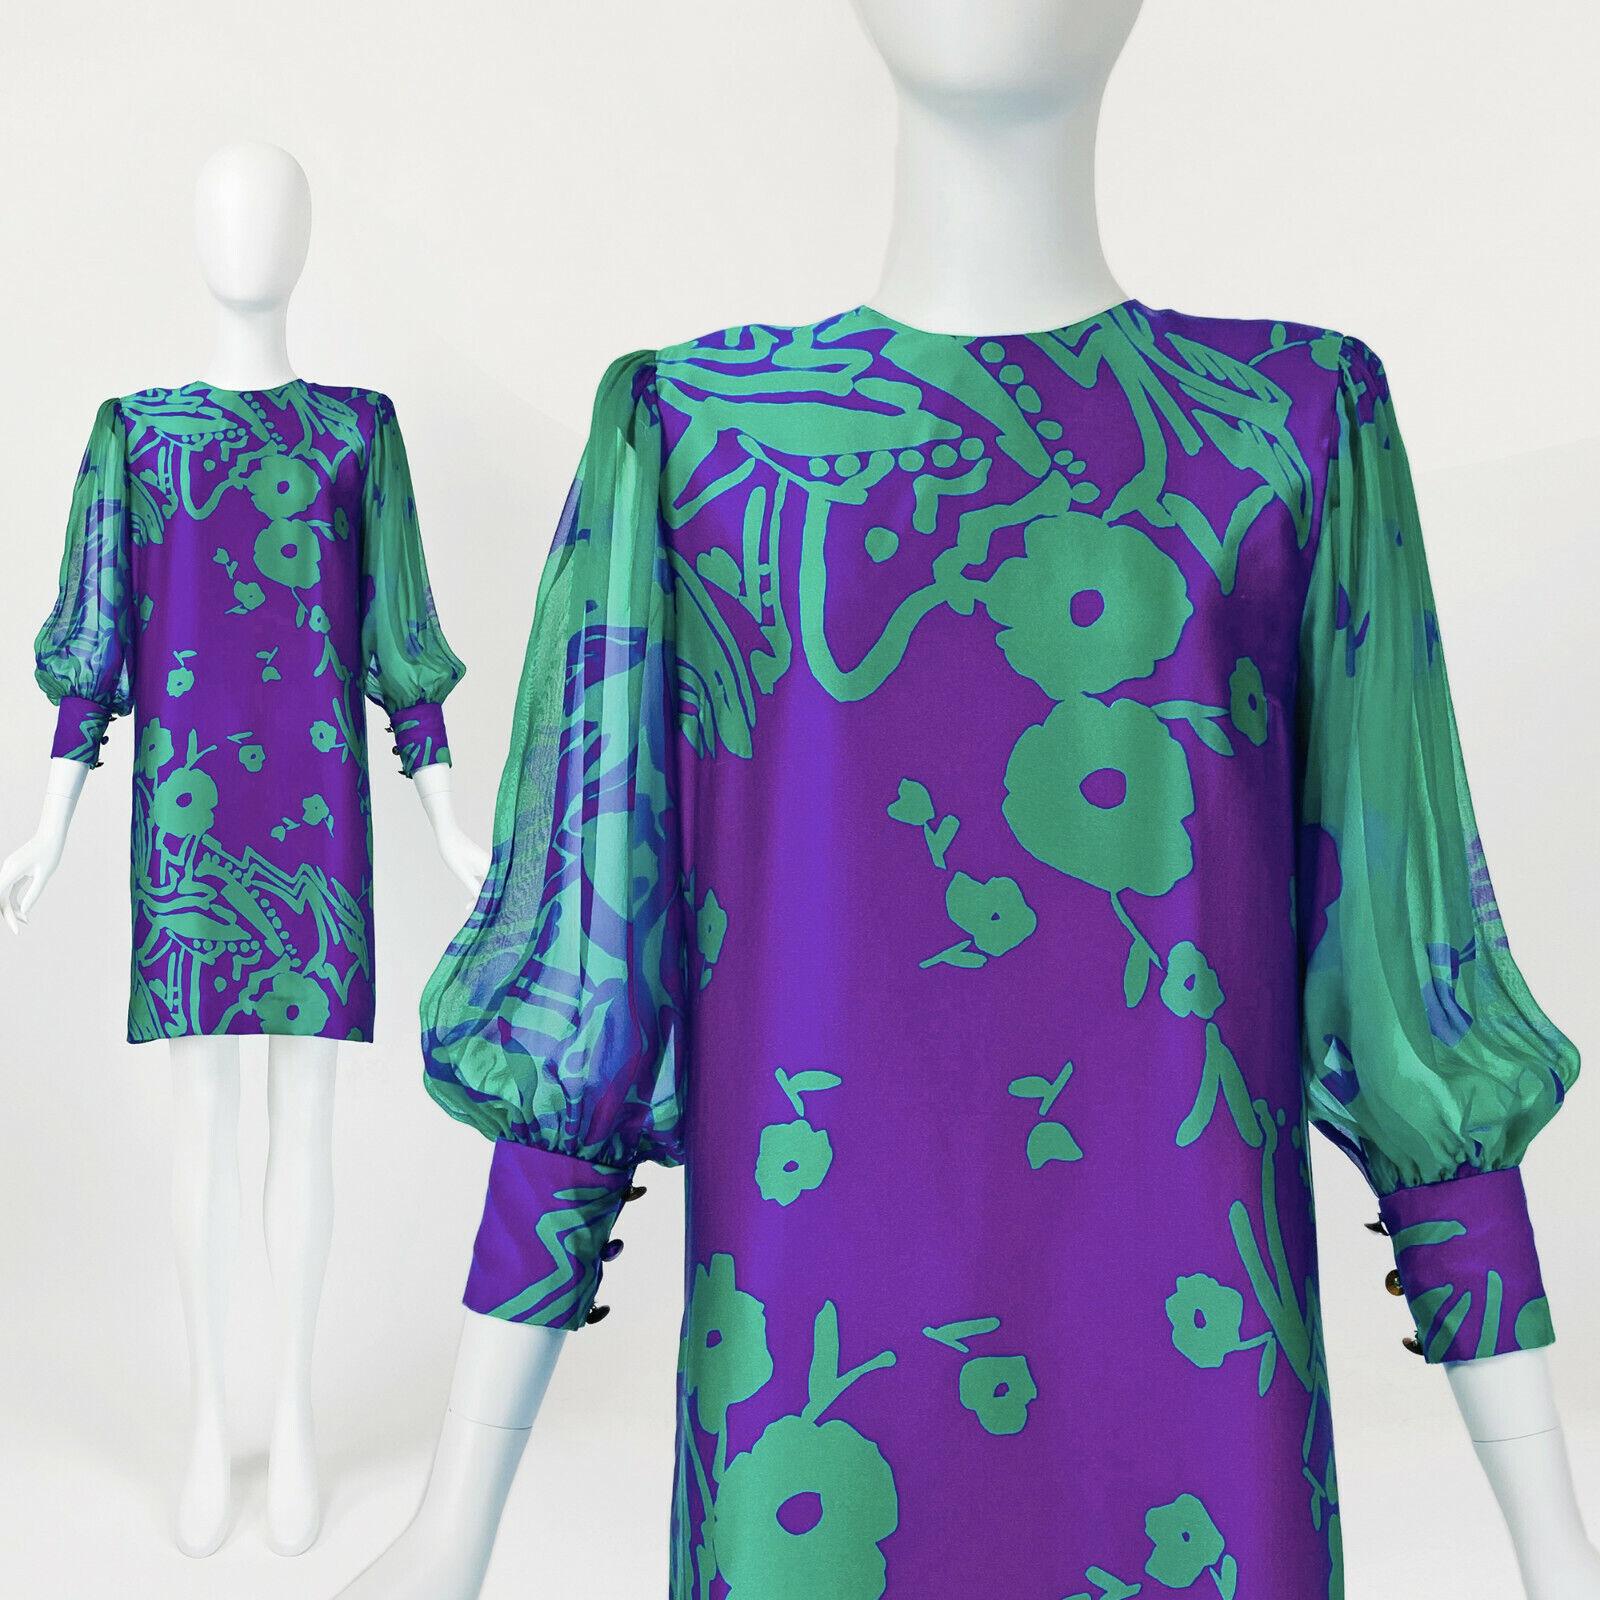 Designer Vintage 80s Silk Dress PAULINE TRIGERE S… - image 1